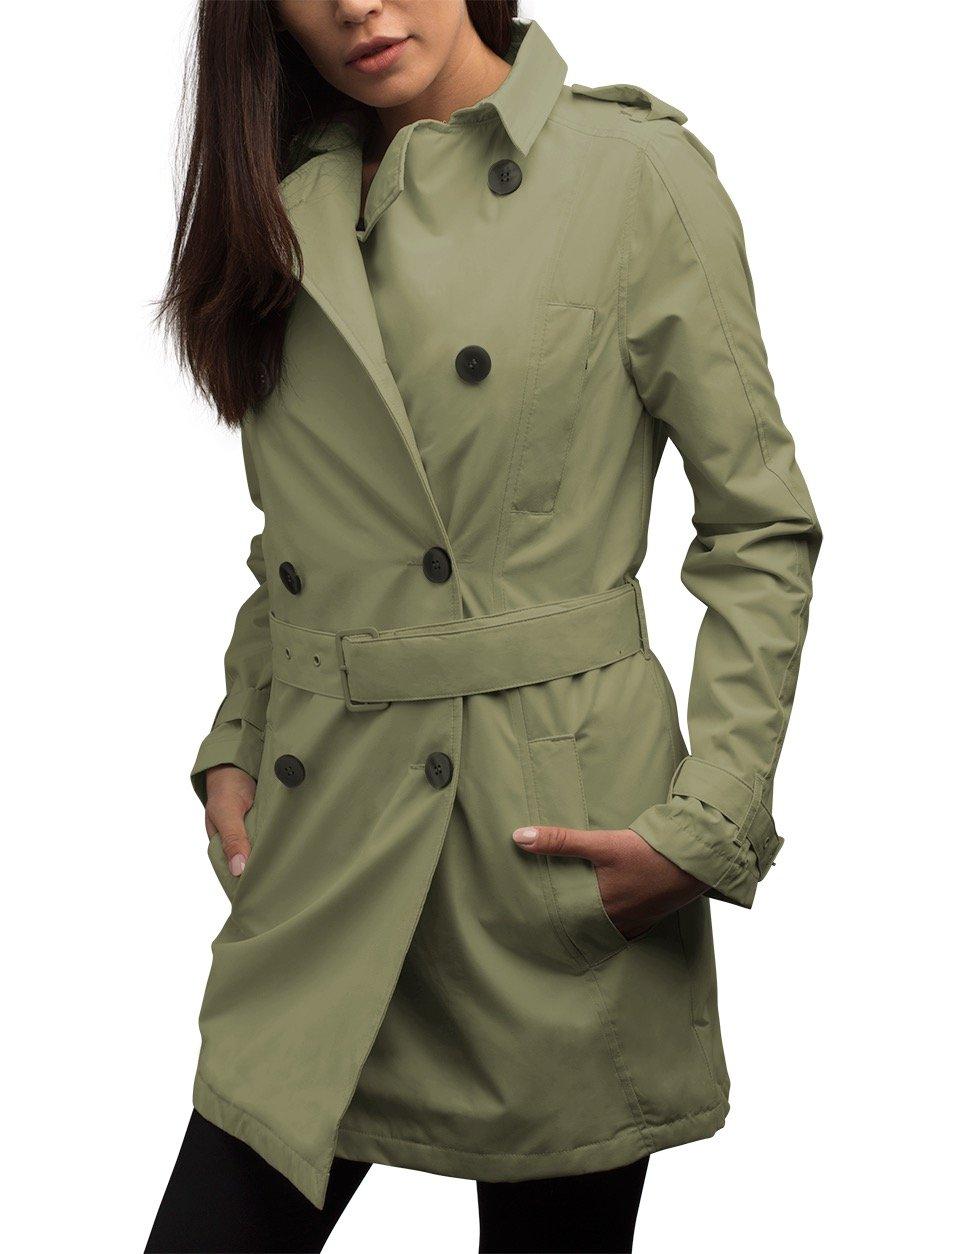 SCOTTeVEST Women's Trench Coat - 18 Pockets - Travel Clothing TYM L